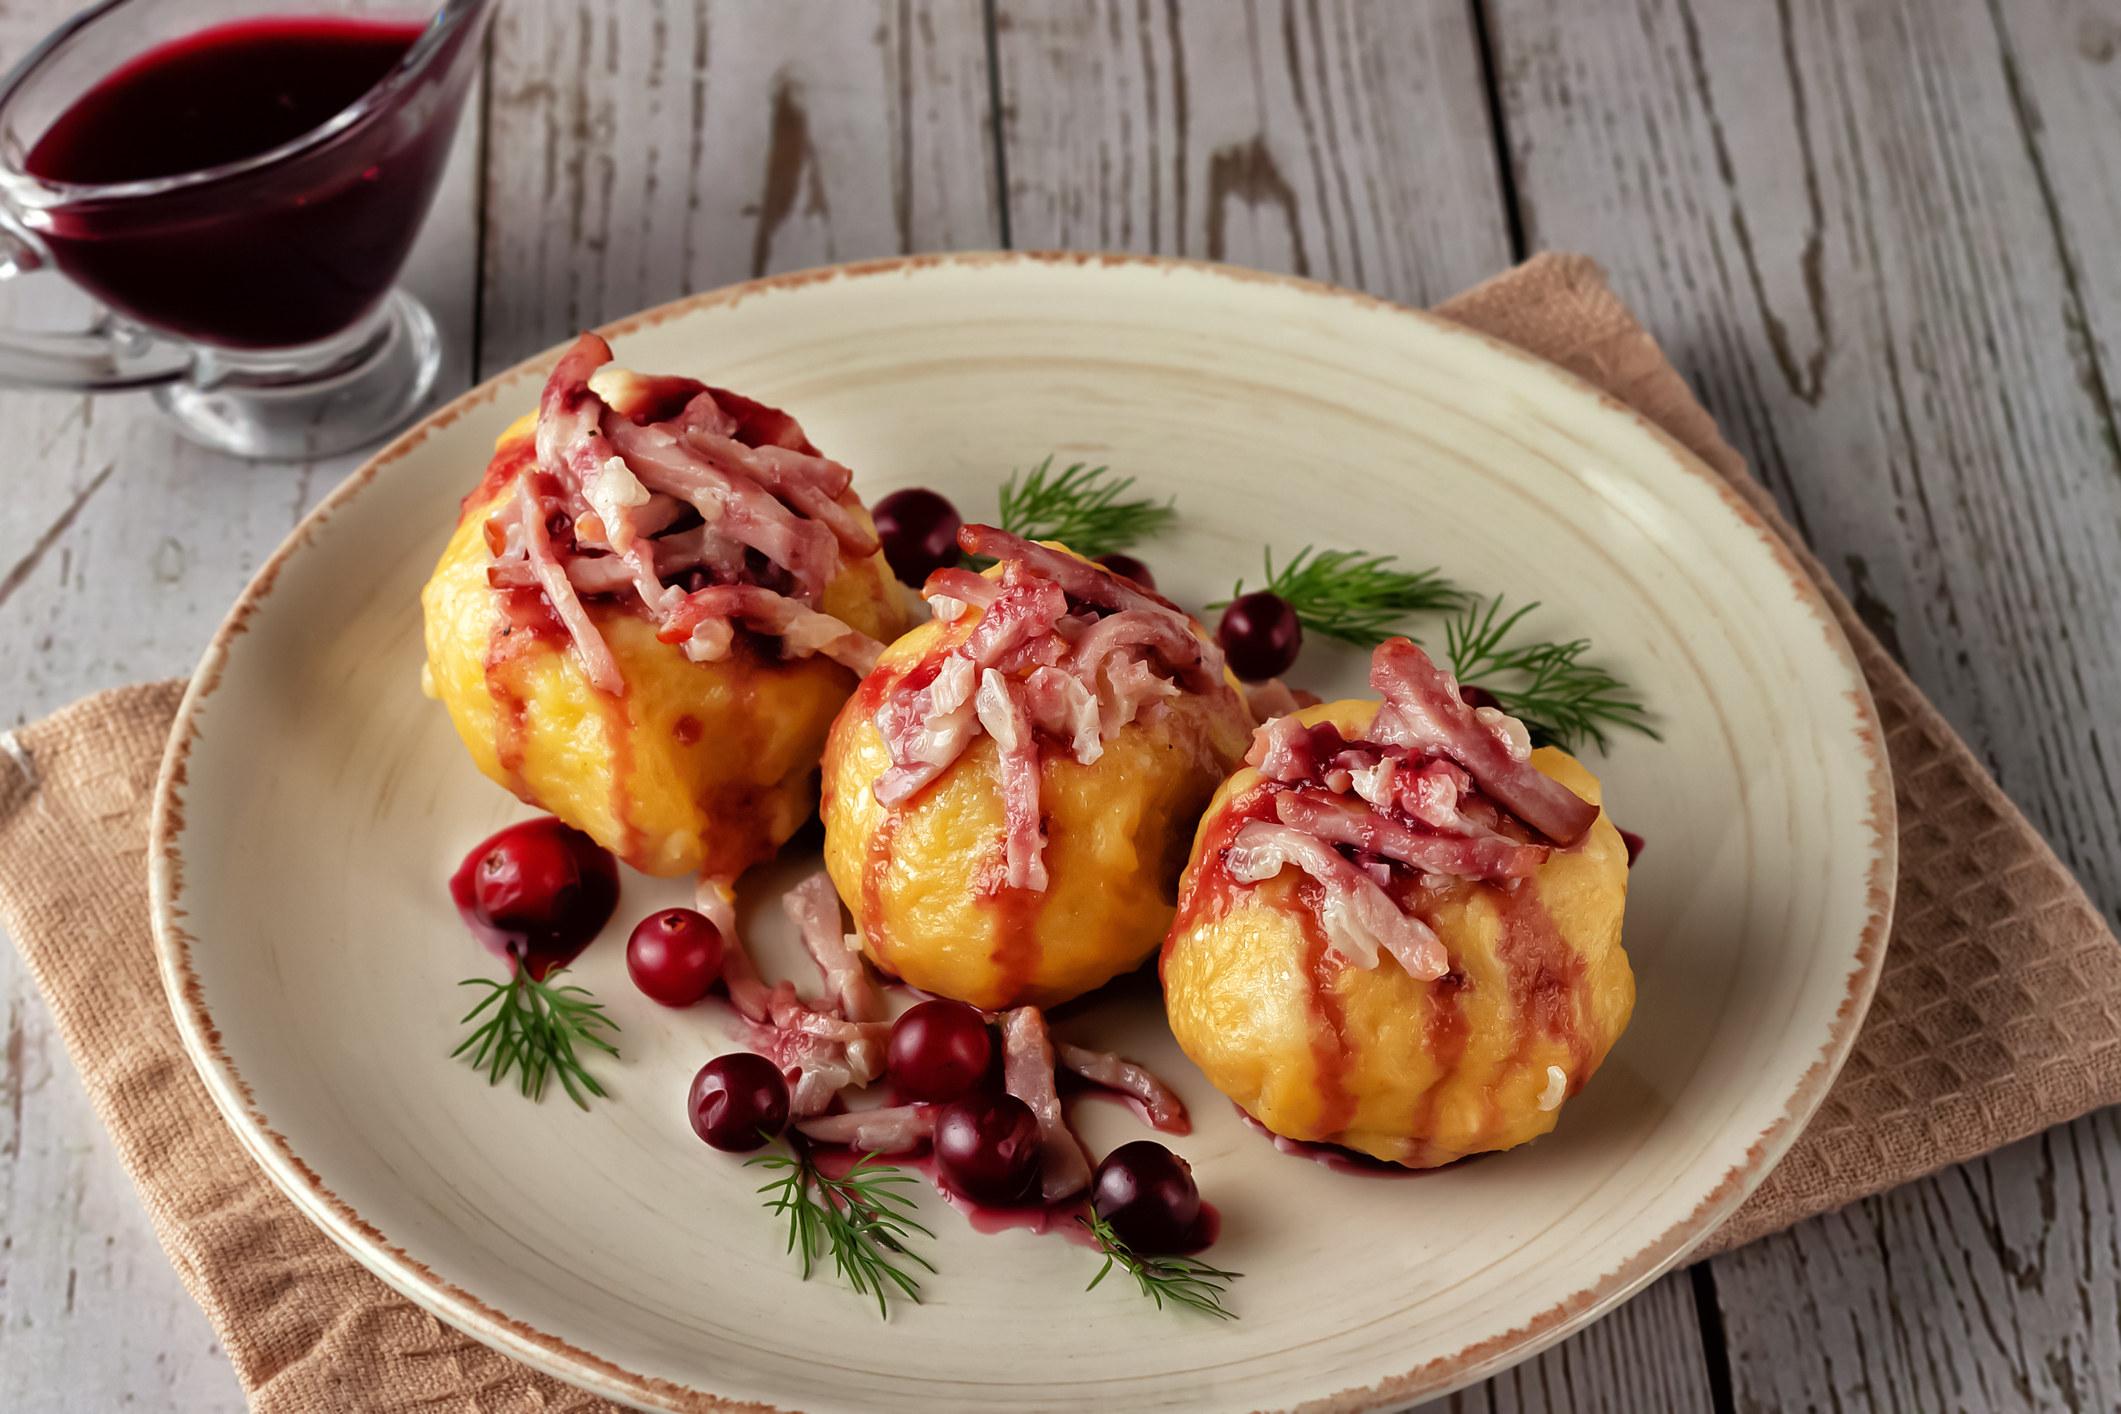 Swedish potato dumplings with gravy and berries.